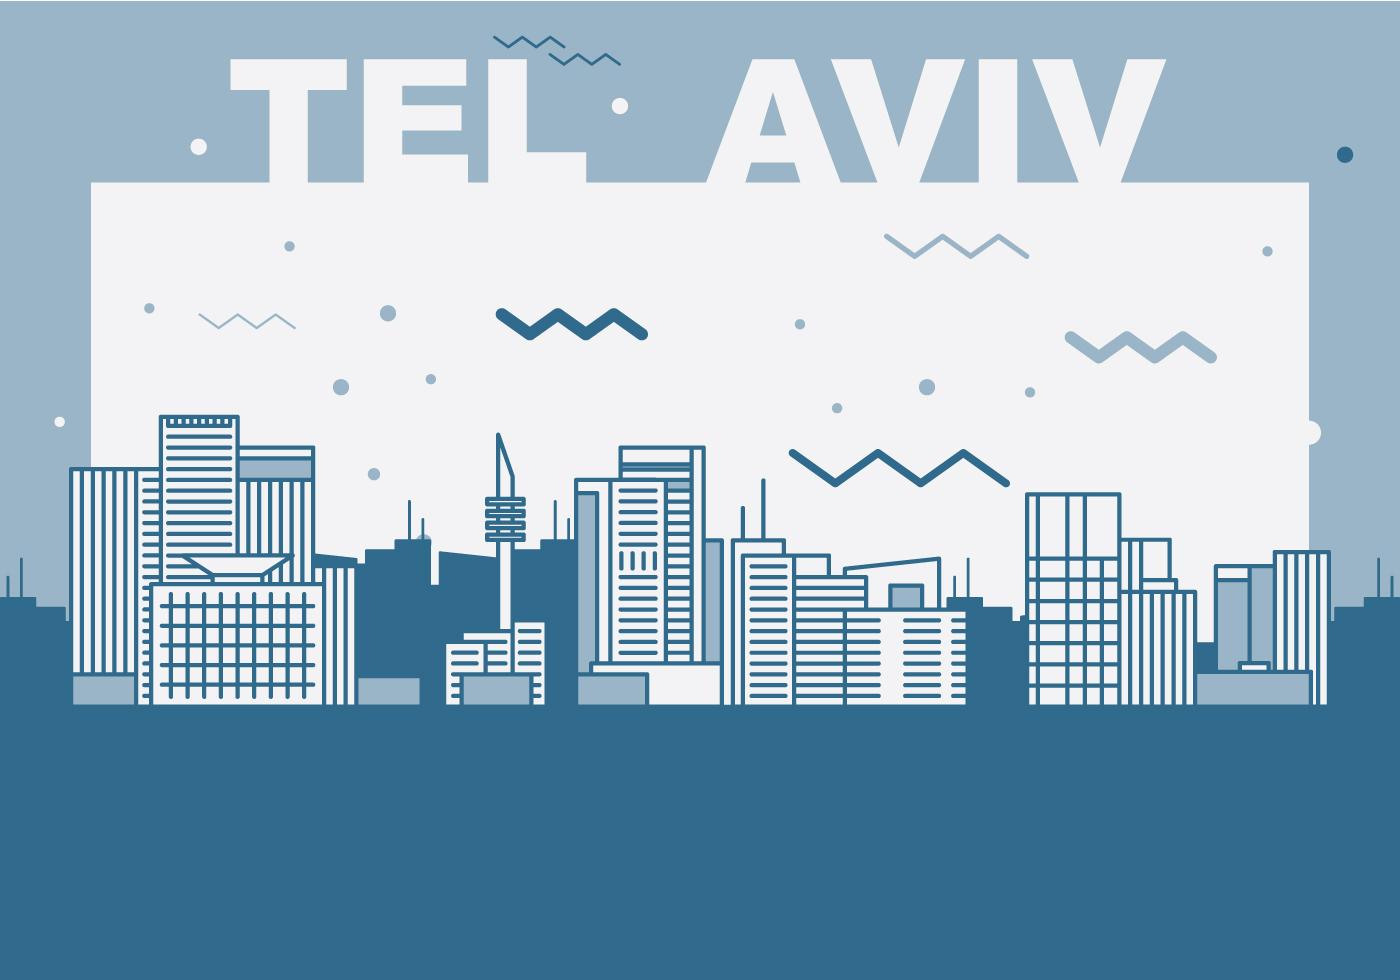 Tel aviv clipart clip art library stock Tel Aviv Free Vector Art - (5 Free Downloads) clip art library stock